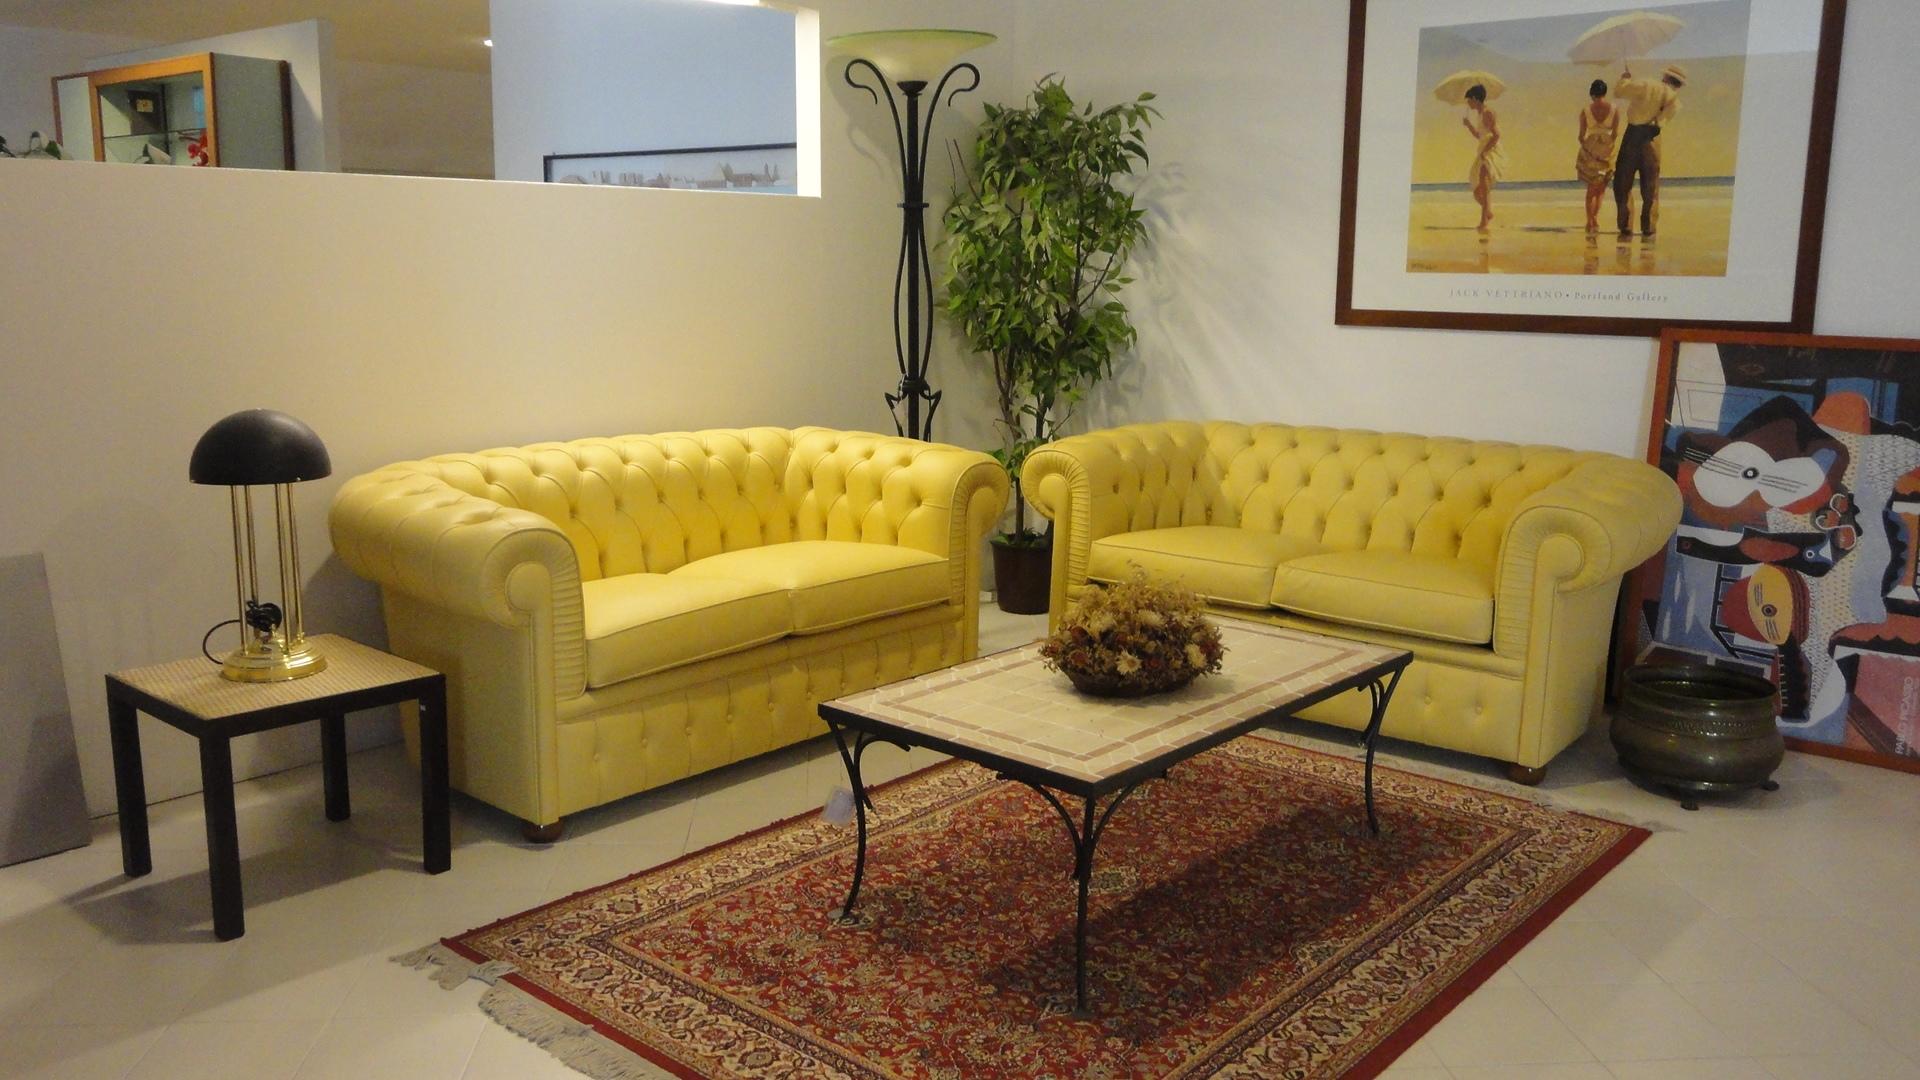 Divani inglesi chesterfield tipi di chesterfield divano for Divani inglesi chesterfield prezzi